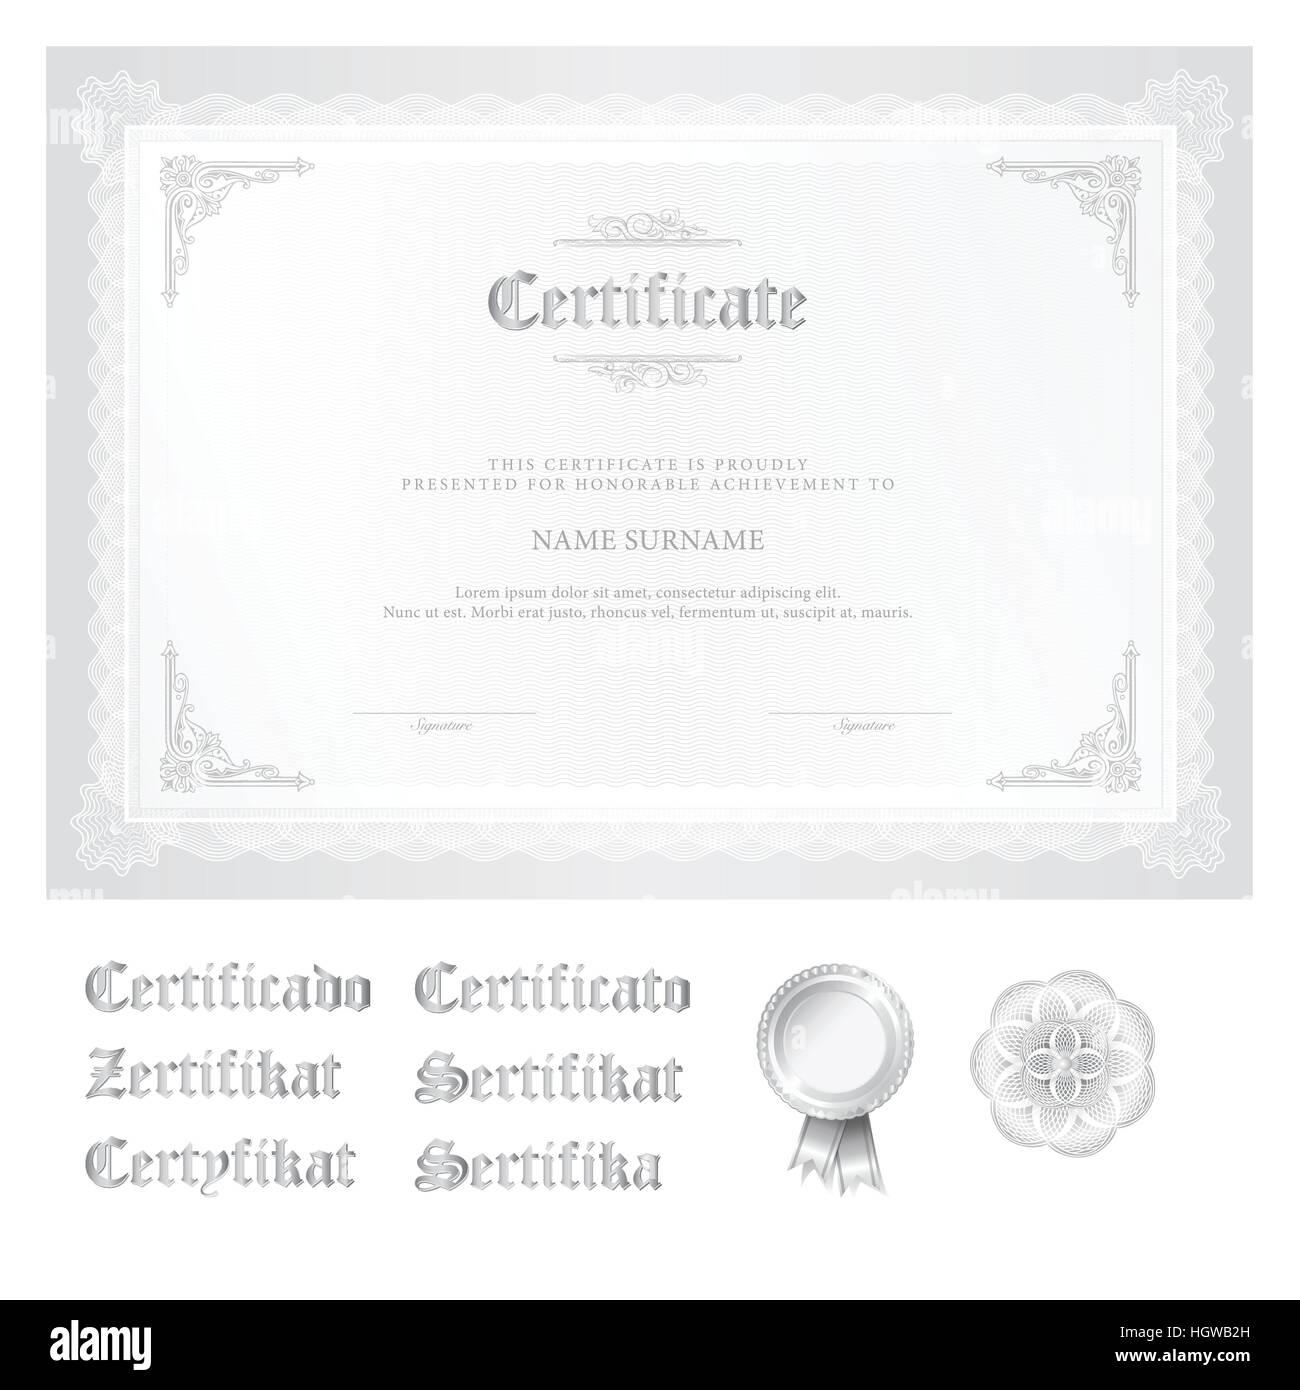 Großzügig Tapferkeit Award Vorlage Fotos - Entry Level Resume ...